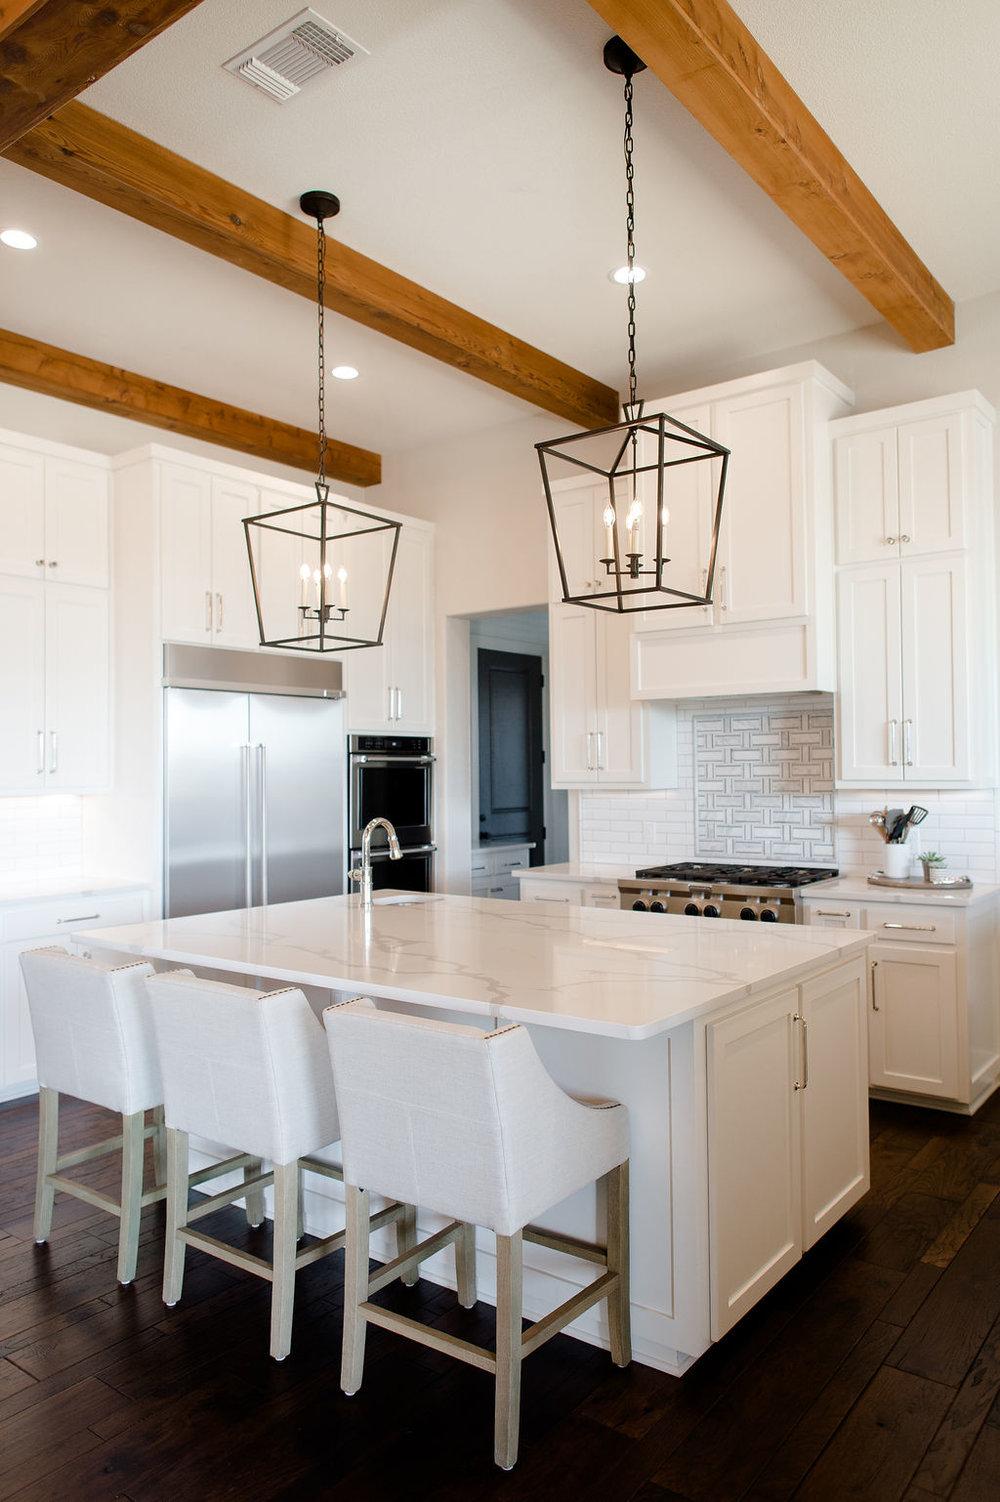 Clark+Design+Studio+and+Renovation+Wichita+Falls,+Texas+Interior+Design+and+Remodeling-150.jpg